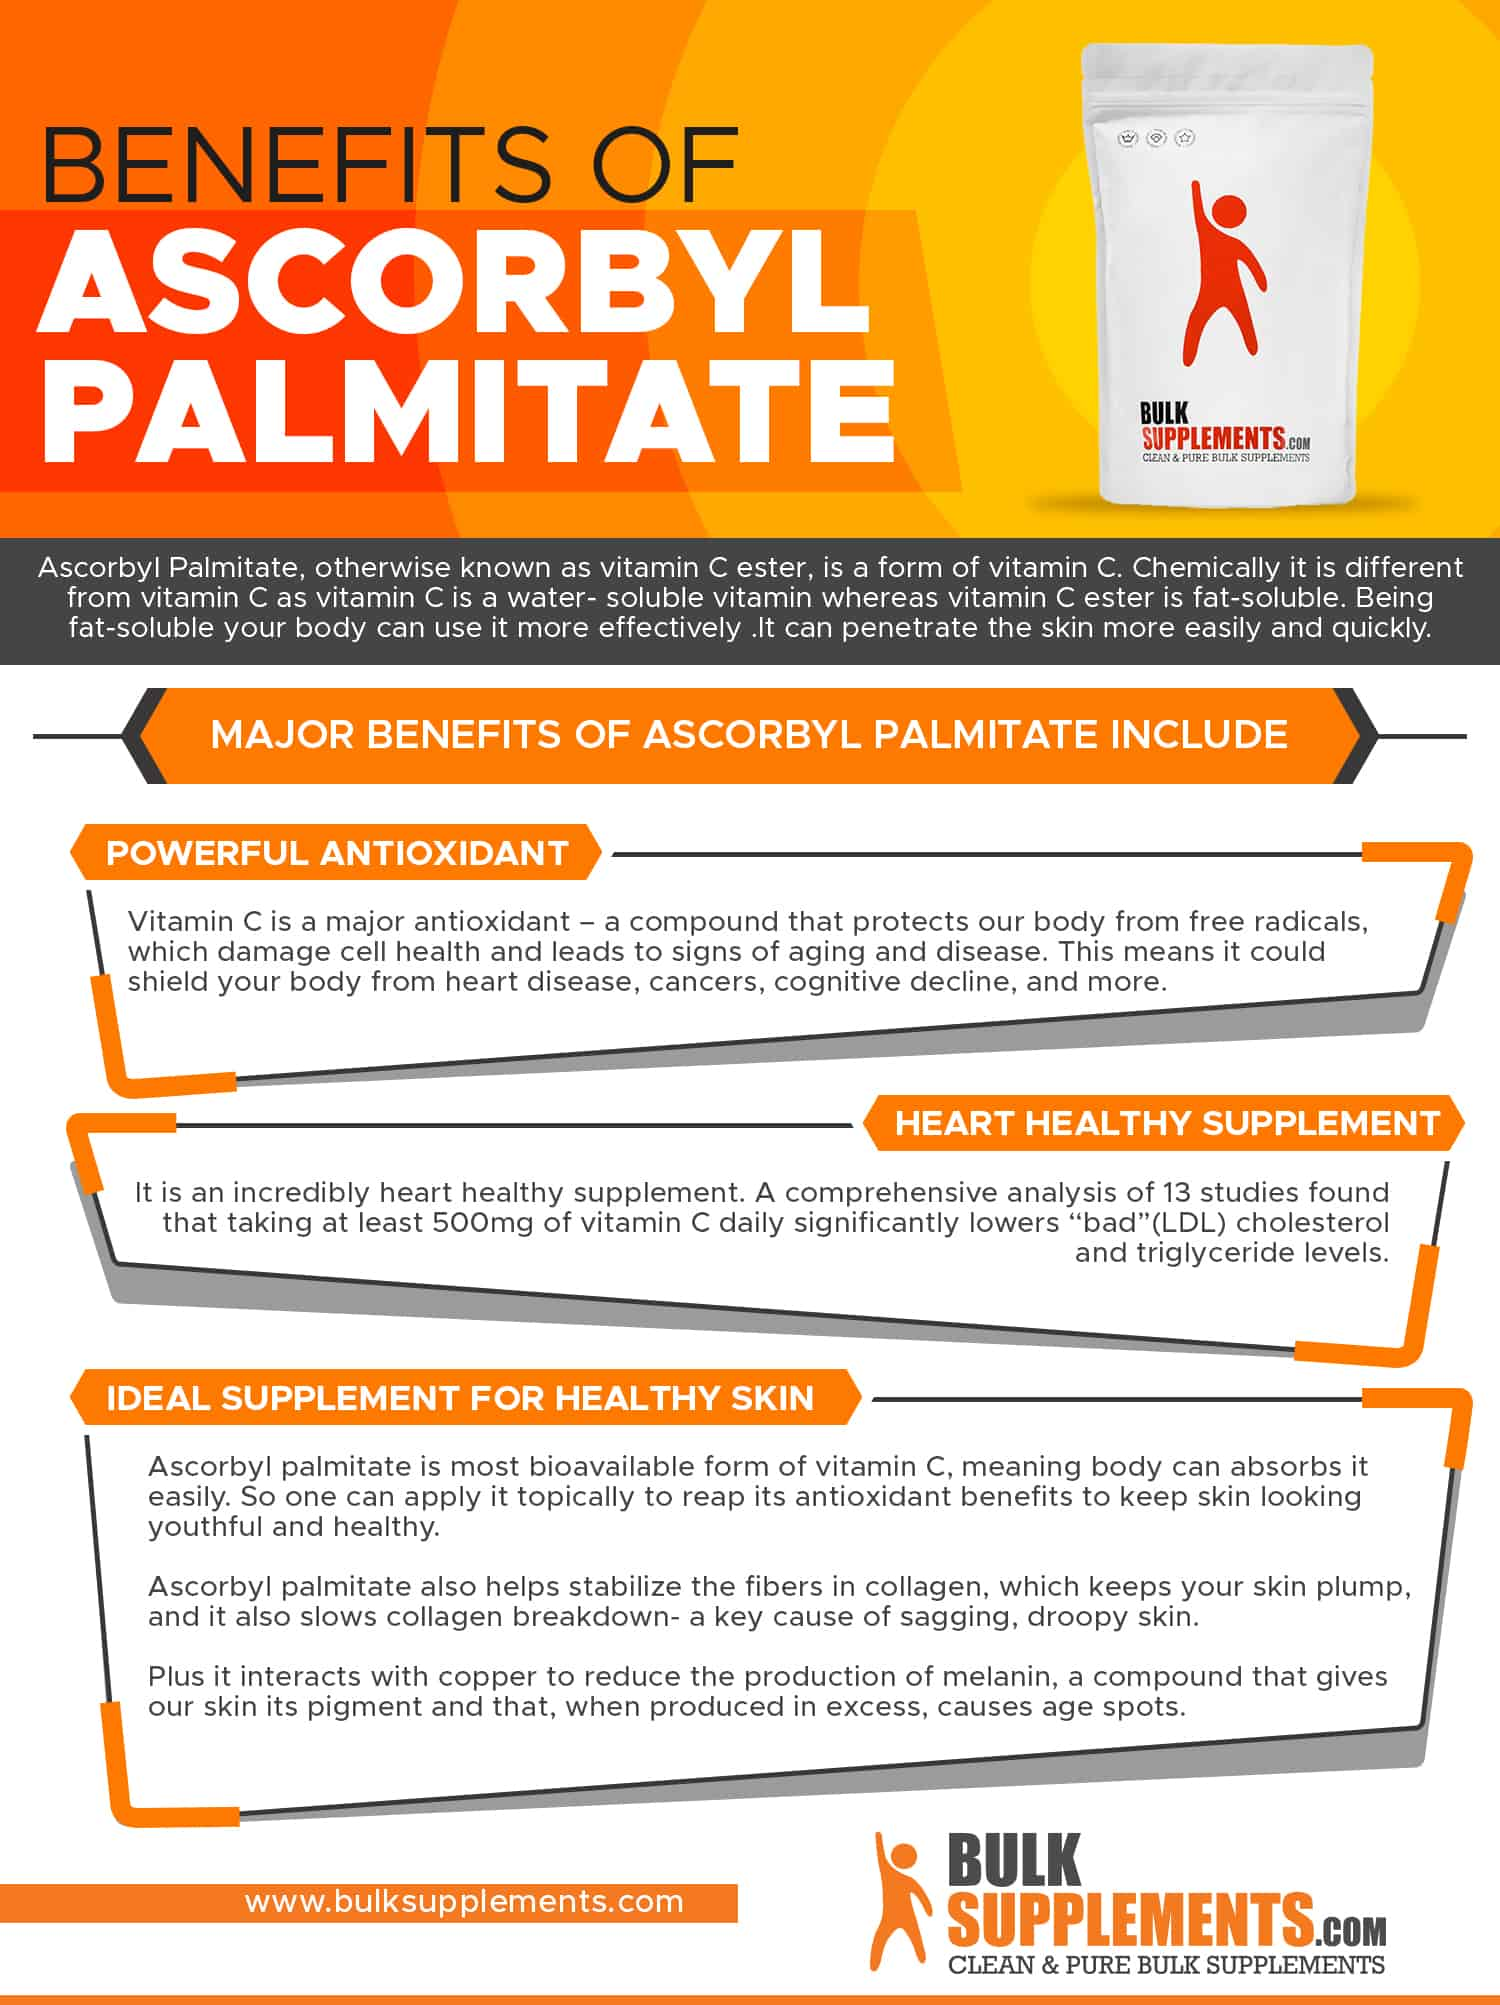 Benefits of Ascorbyl Palmitate